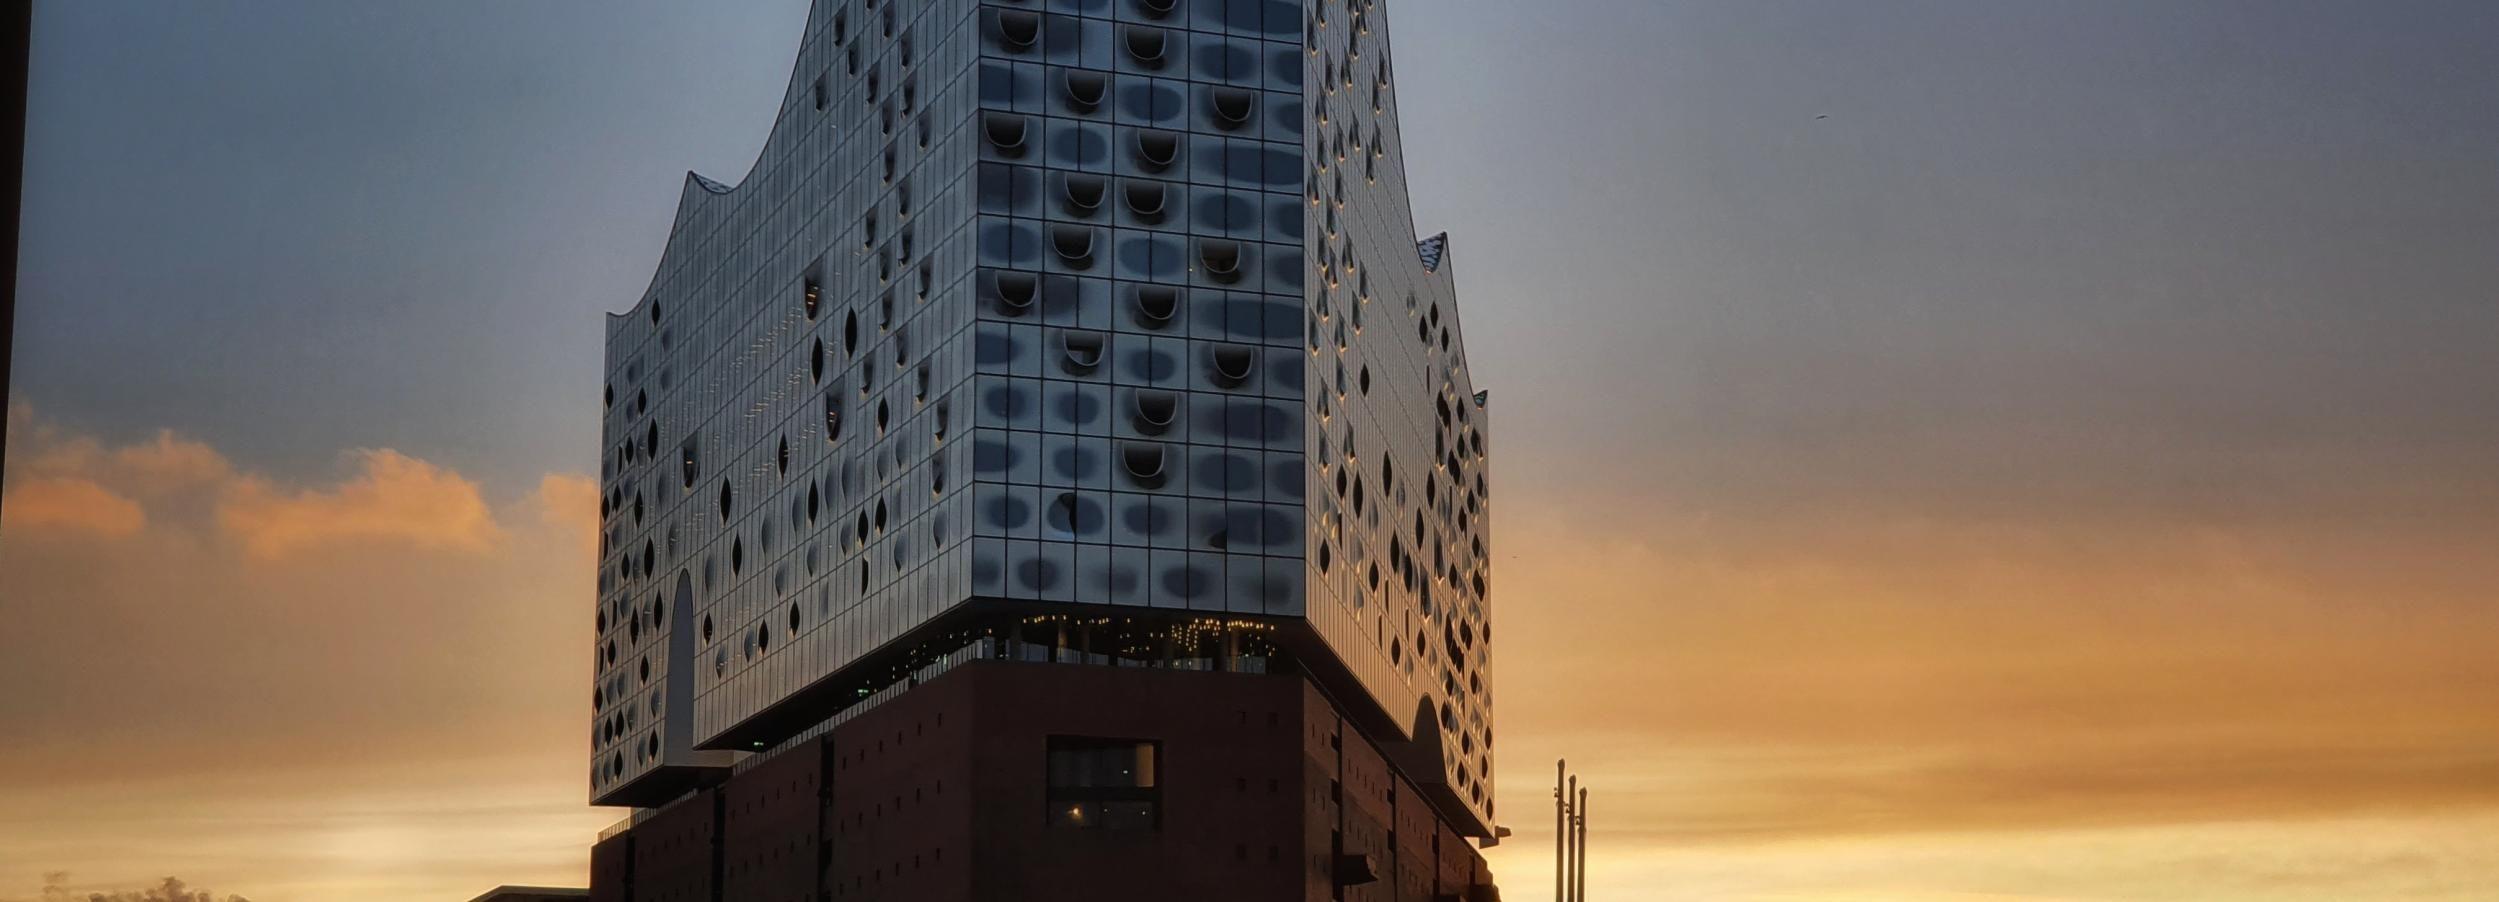 Hamburg: Express Outer Elbphilharmonie Guided Tour